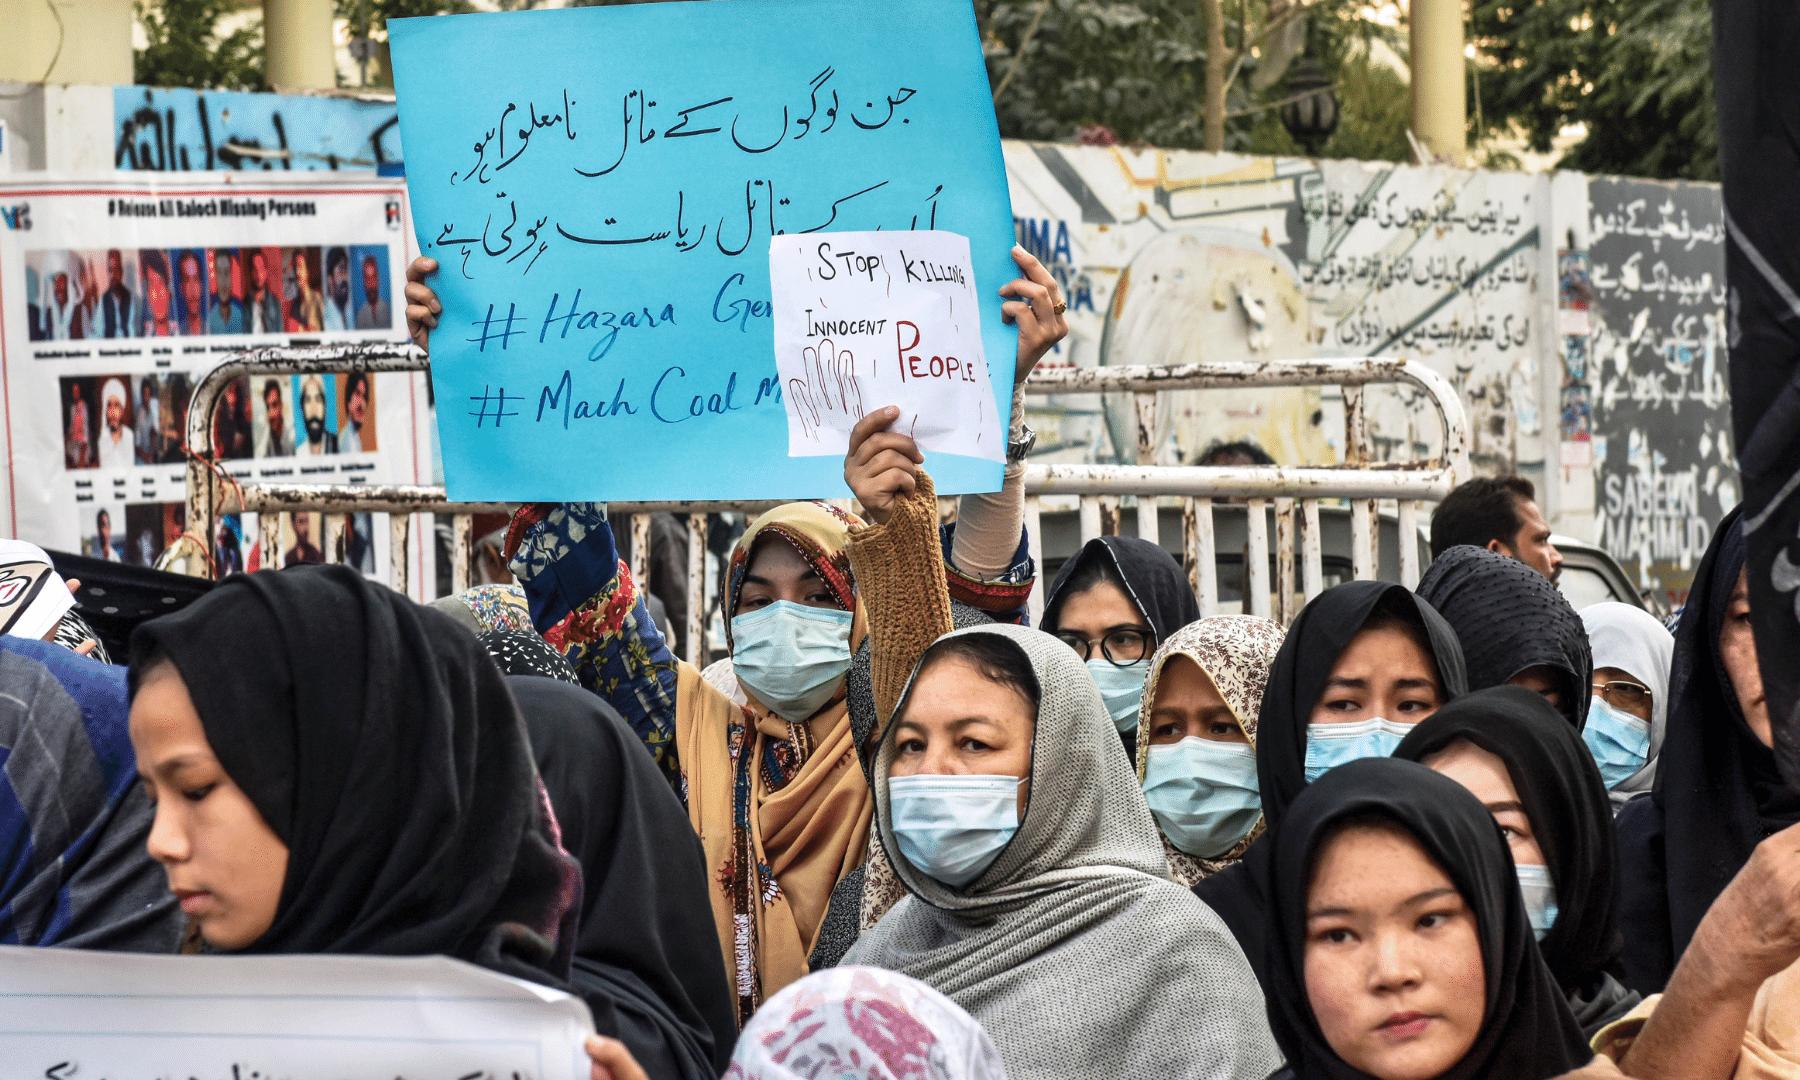 Members of the Shia Hazara community protest outside the Karachi Press Club on Jan 5. — Shakeel Adil/ White Star